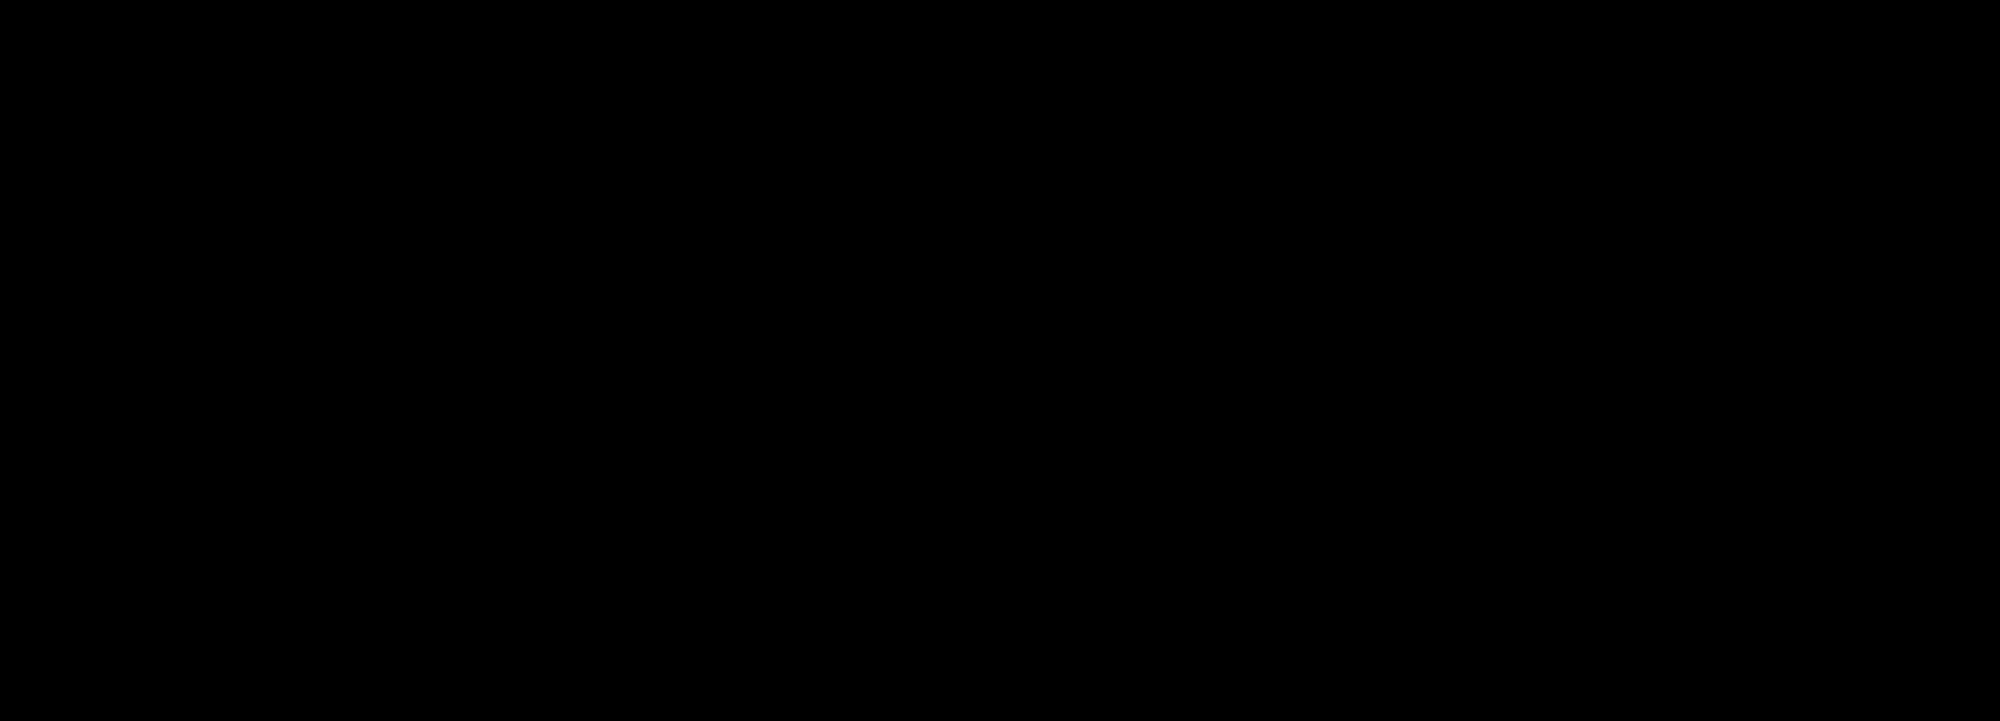 T.D.Mechanical-logo7.png